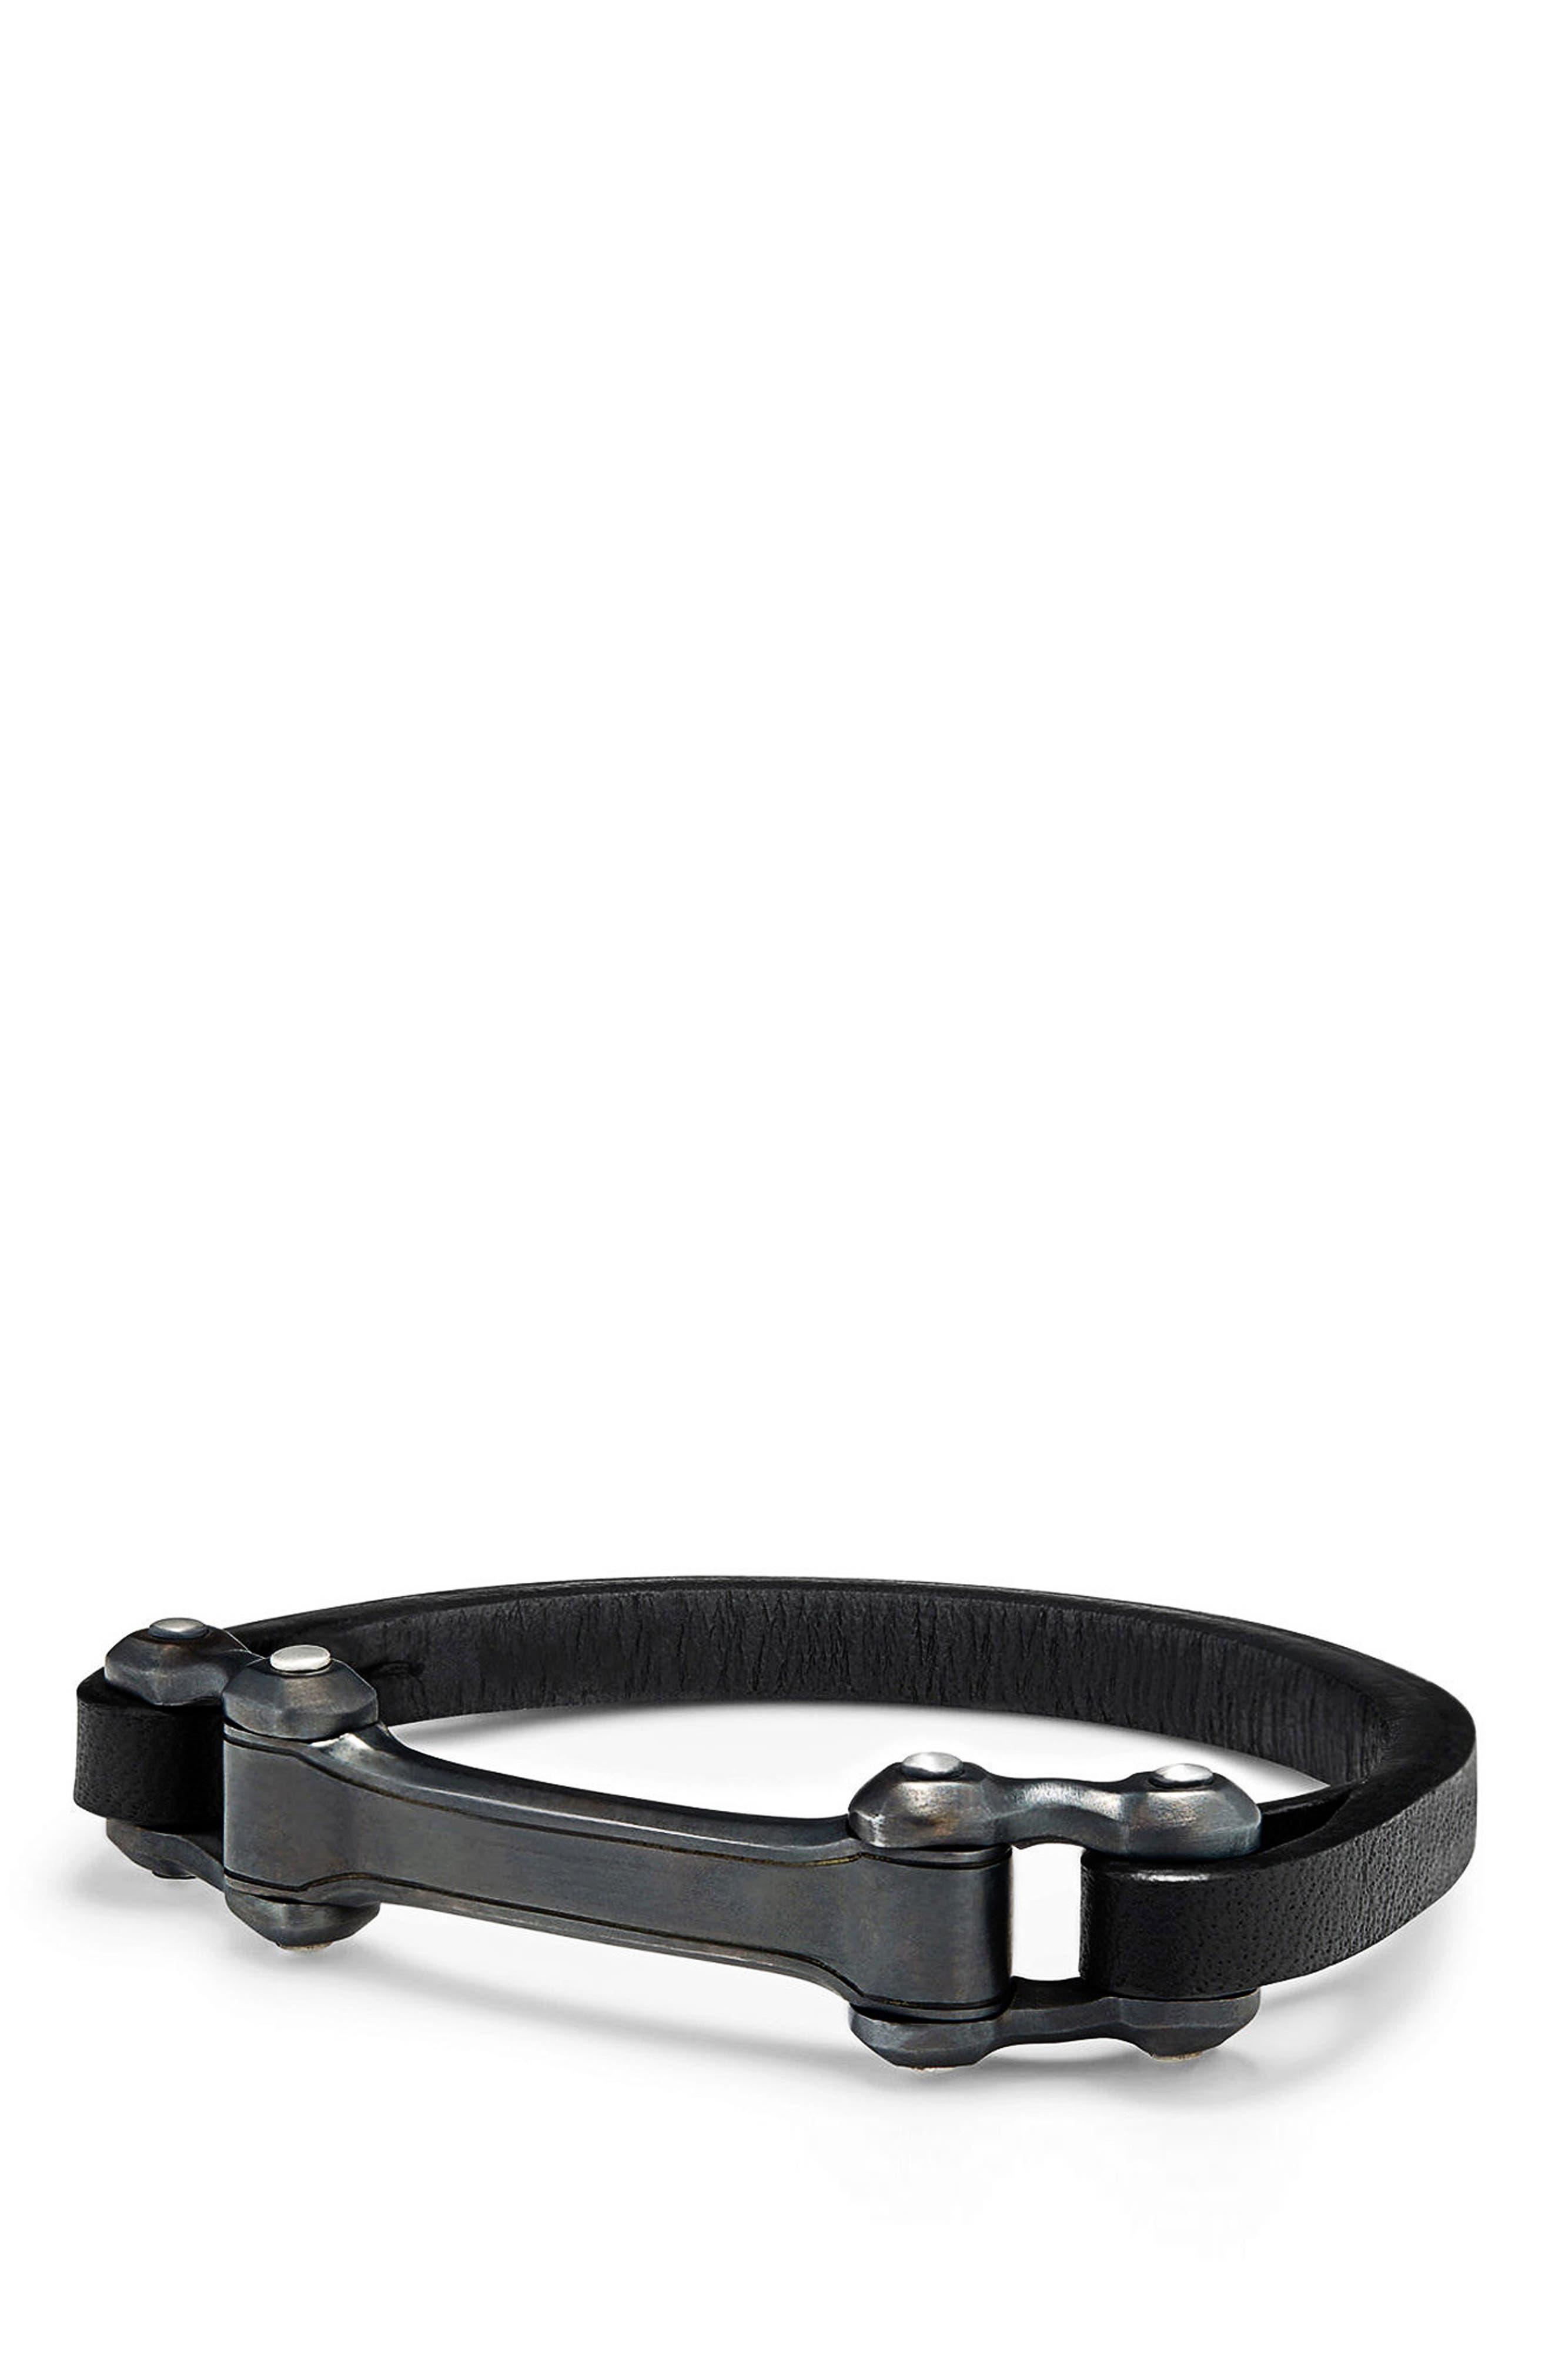 Anvil ID Bracelet,                         Main,                         color, SILVER/ STEEL/ BLACK LEATHER